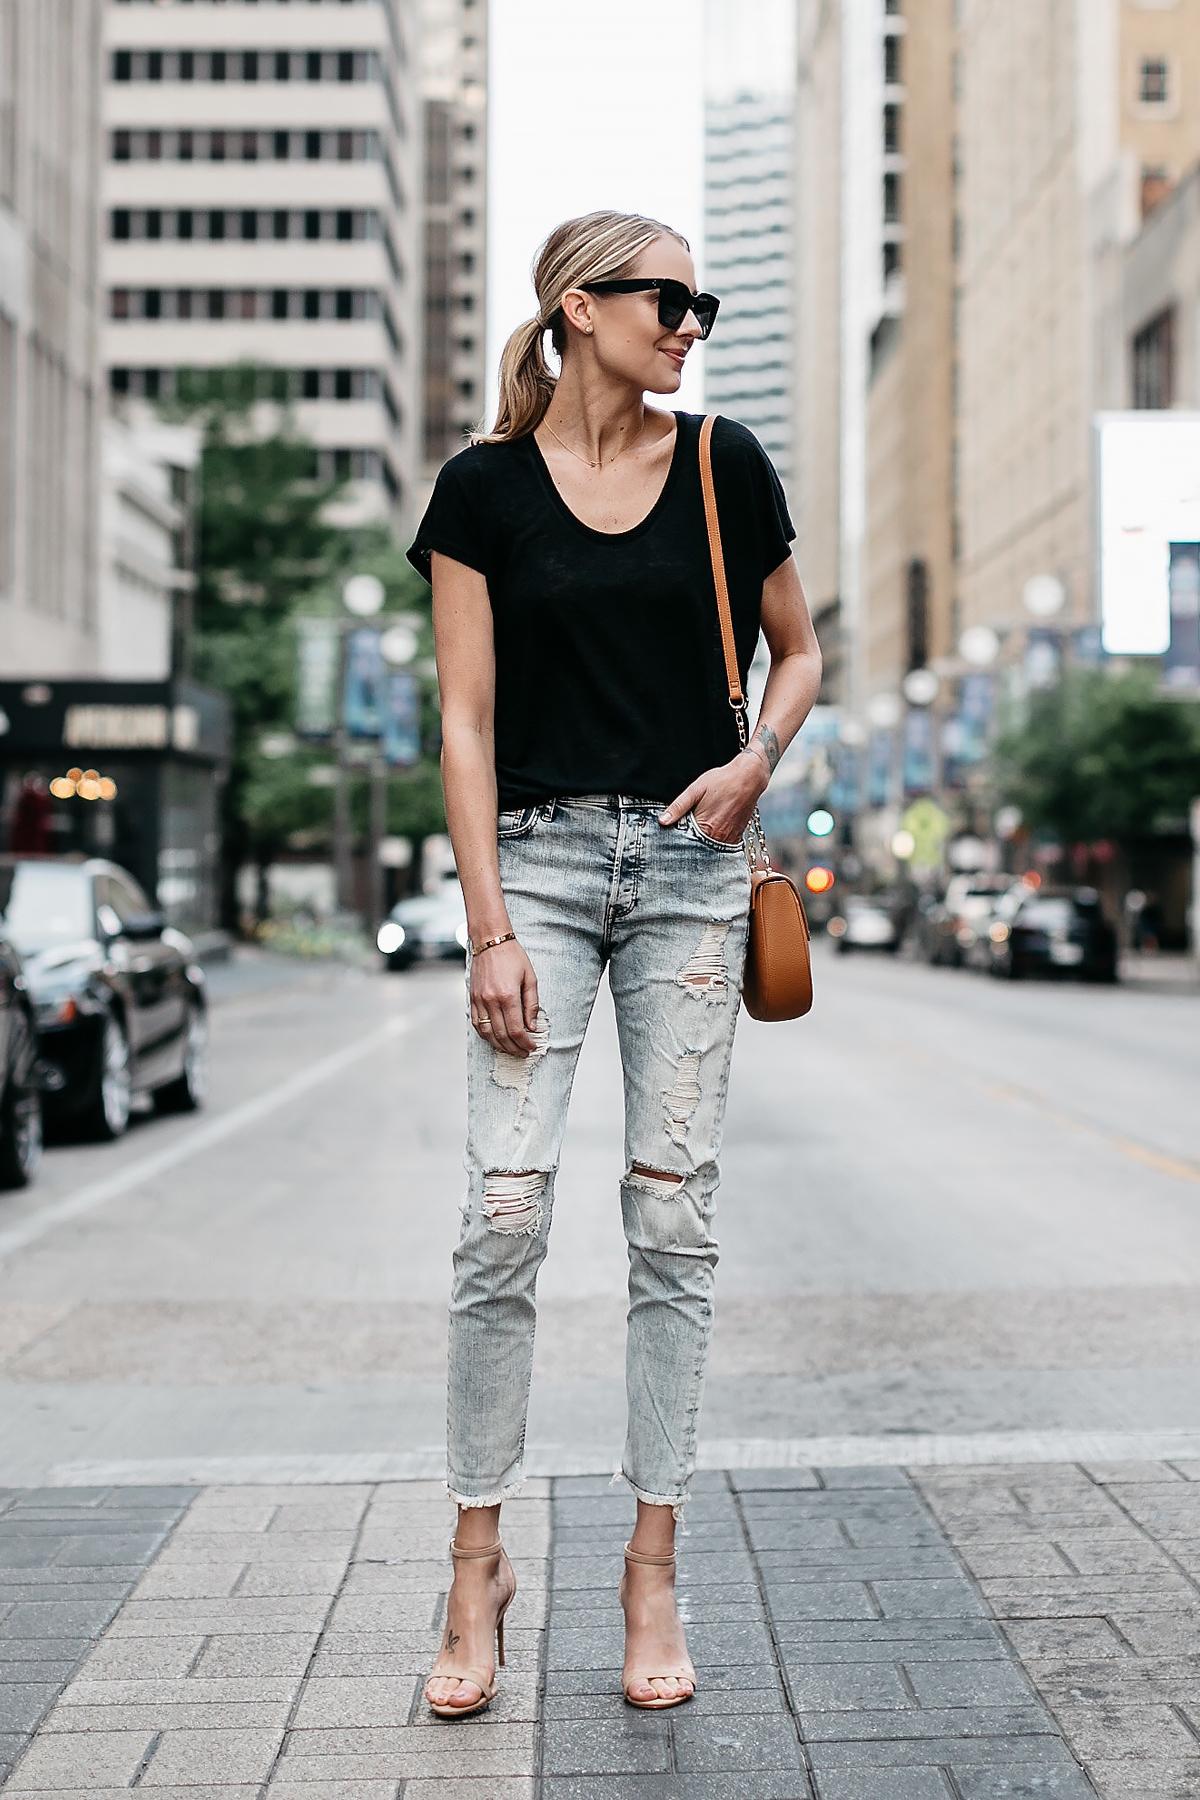 Blonde Woman Wearing Express Black Tshirt Express Ripped Jeans Tan Ankle Strap Heeled Sandals Tan Handbag Fashion Jackson Dallas Blogger Fashion Blogger Street Style